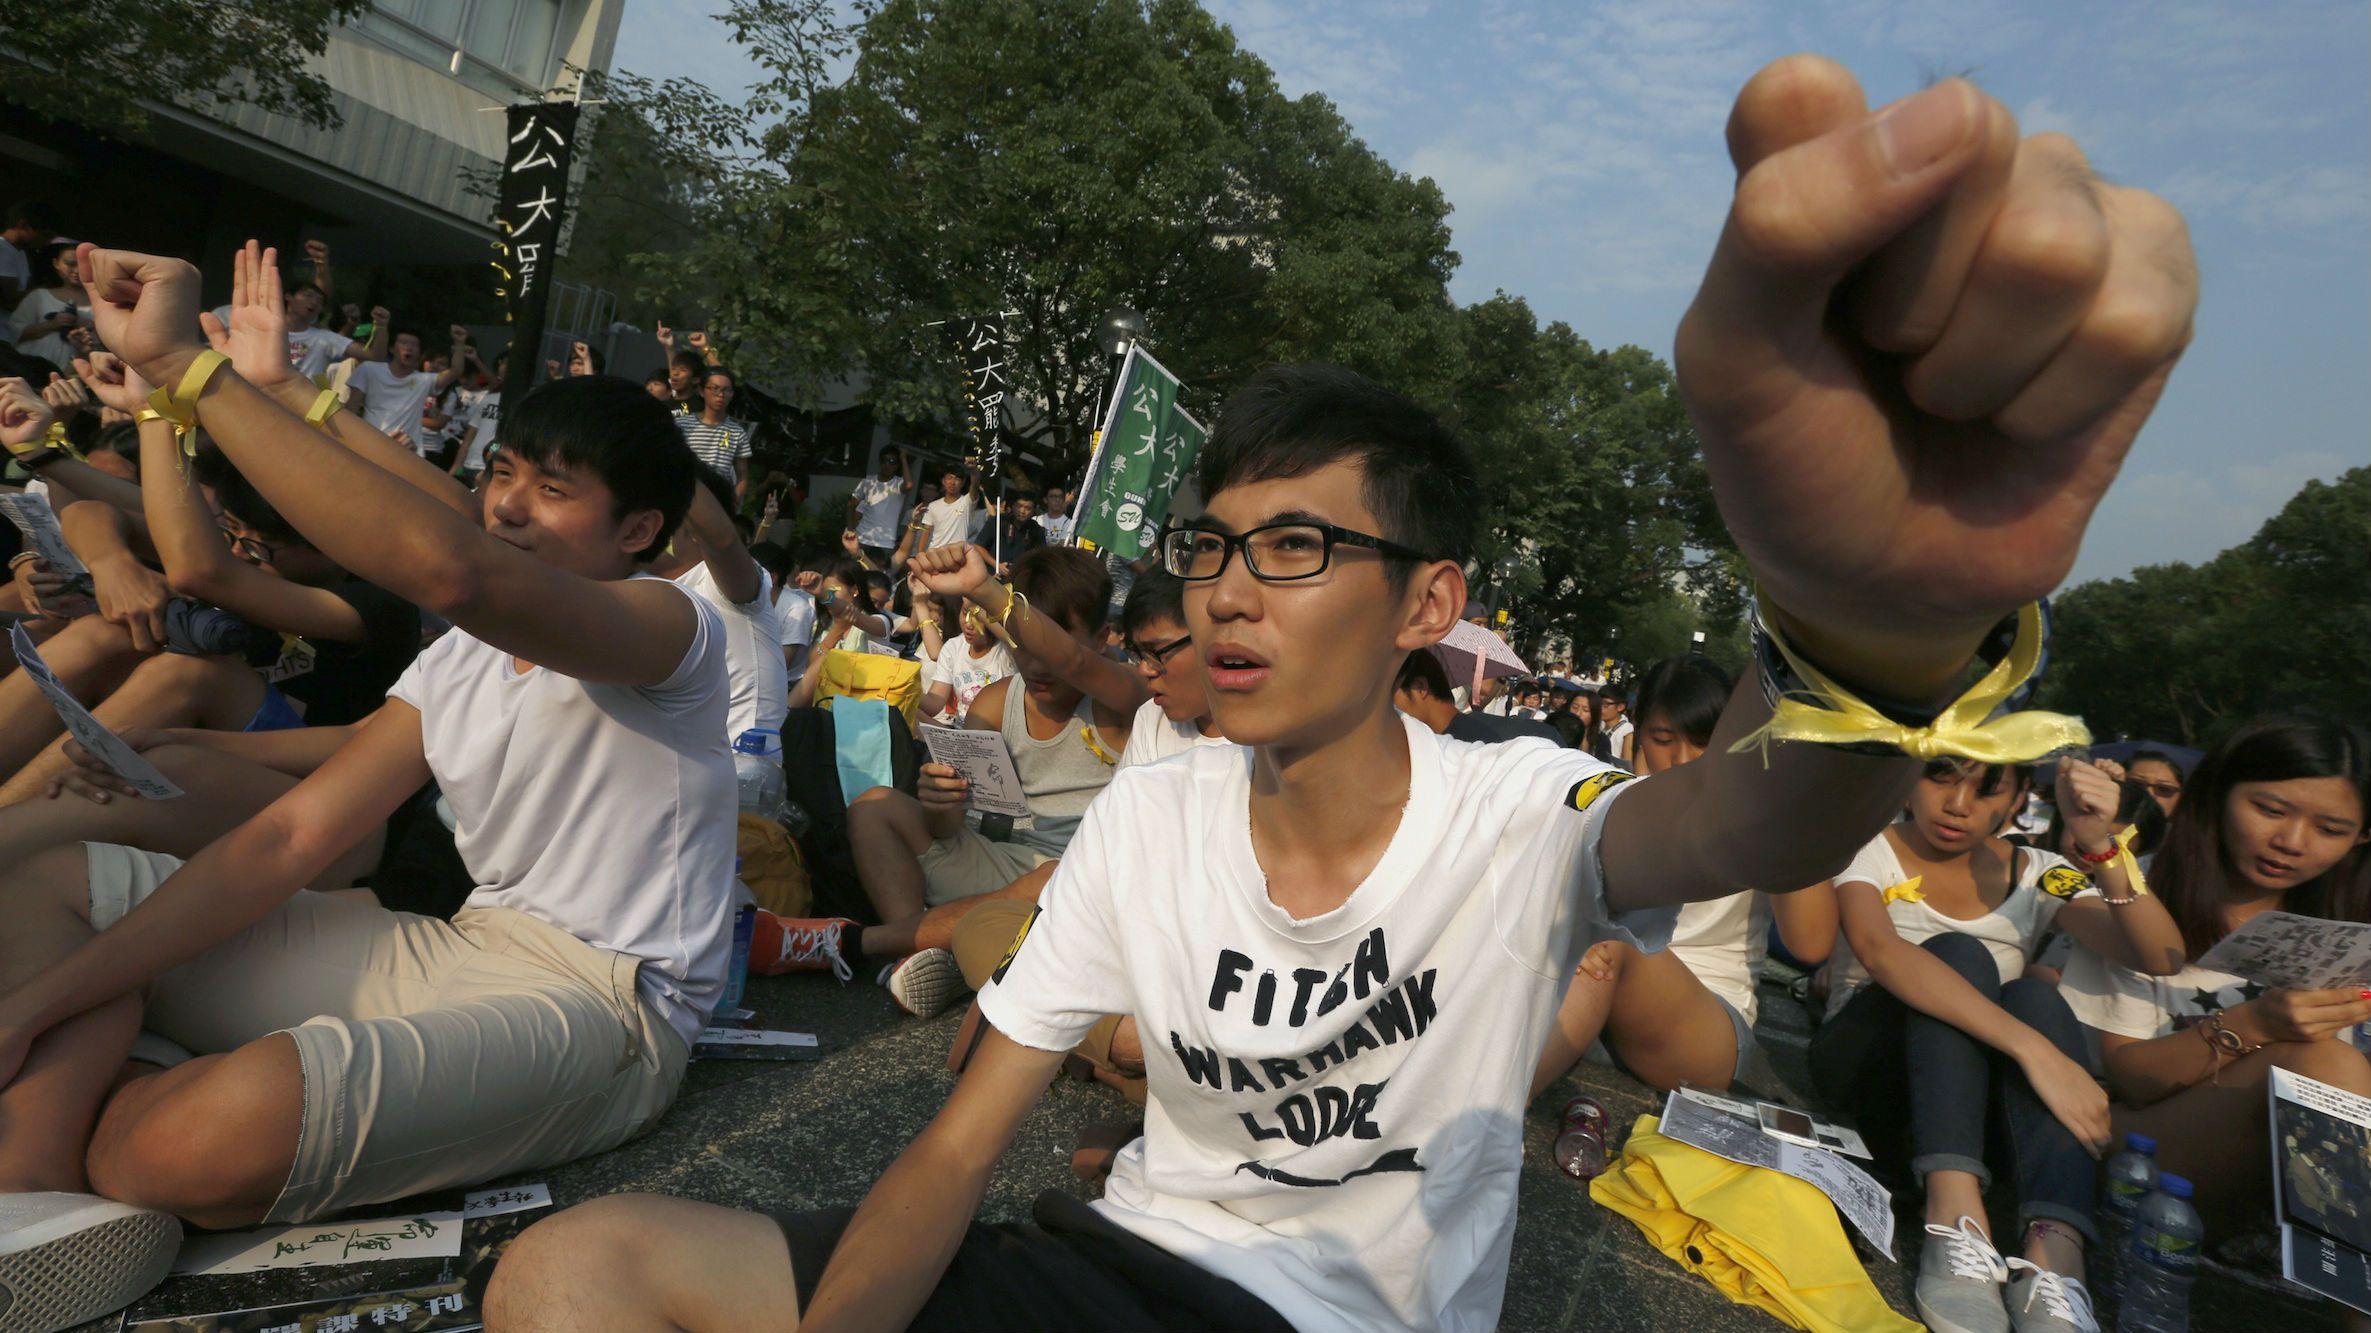 University students chant slogans at the Chinese University of Hong Kong as they boycott classes in Hong Kong September 22, 2014